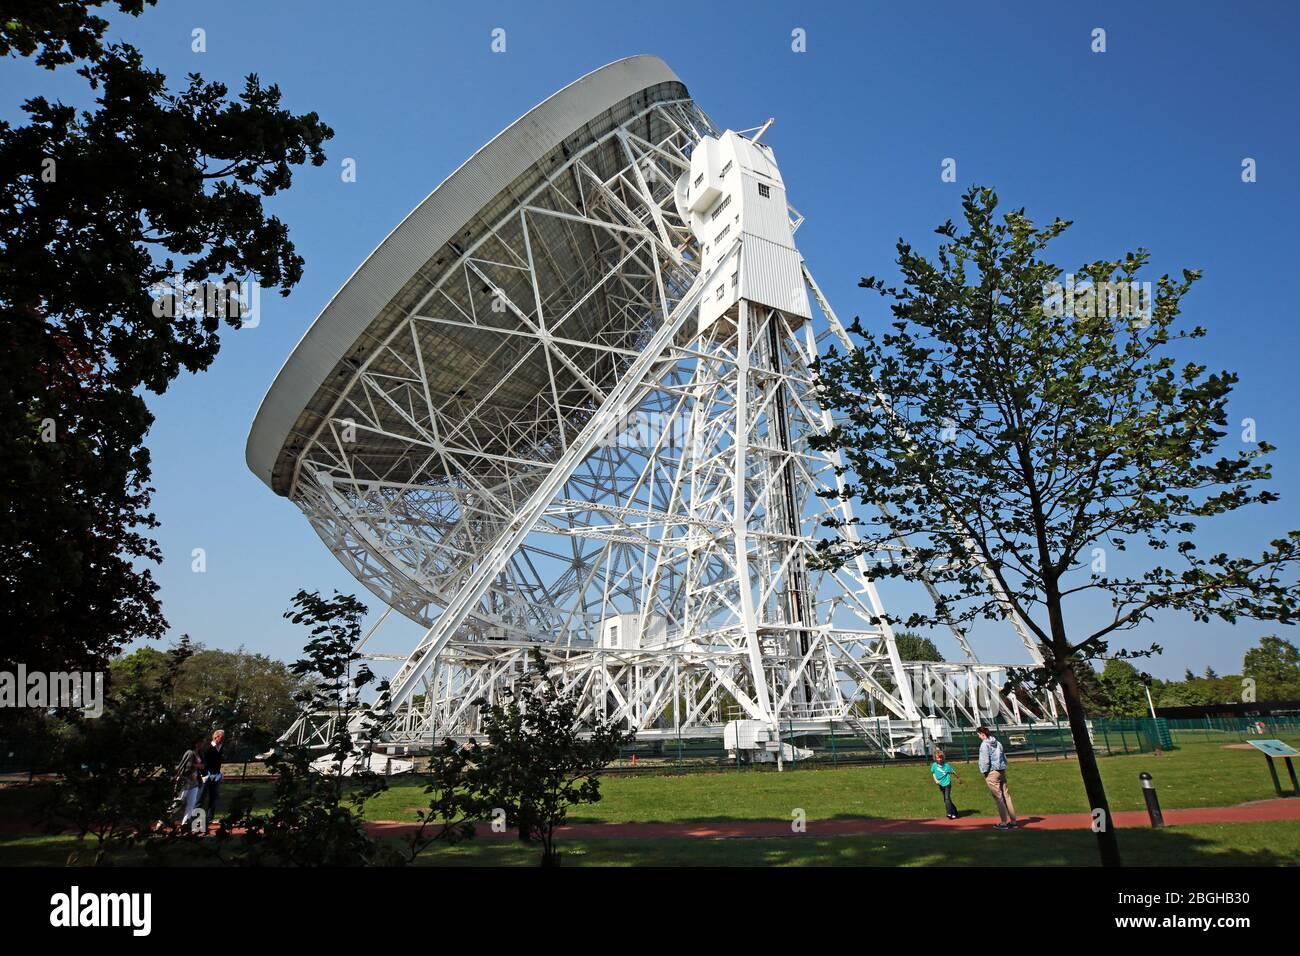 Dieses Stockfoto: Jodrell Bank Radioteleskop, Jodrell Bank Observatory, Holmes Chapel, The University of Manchester, Macclesfield, Cheshire, England, UK, Sk11 9DL - 2BGHB3